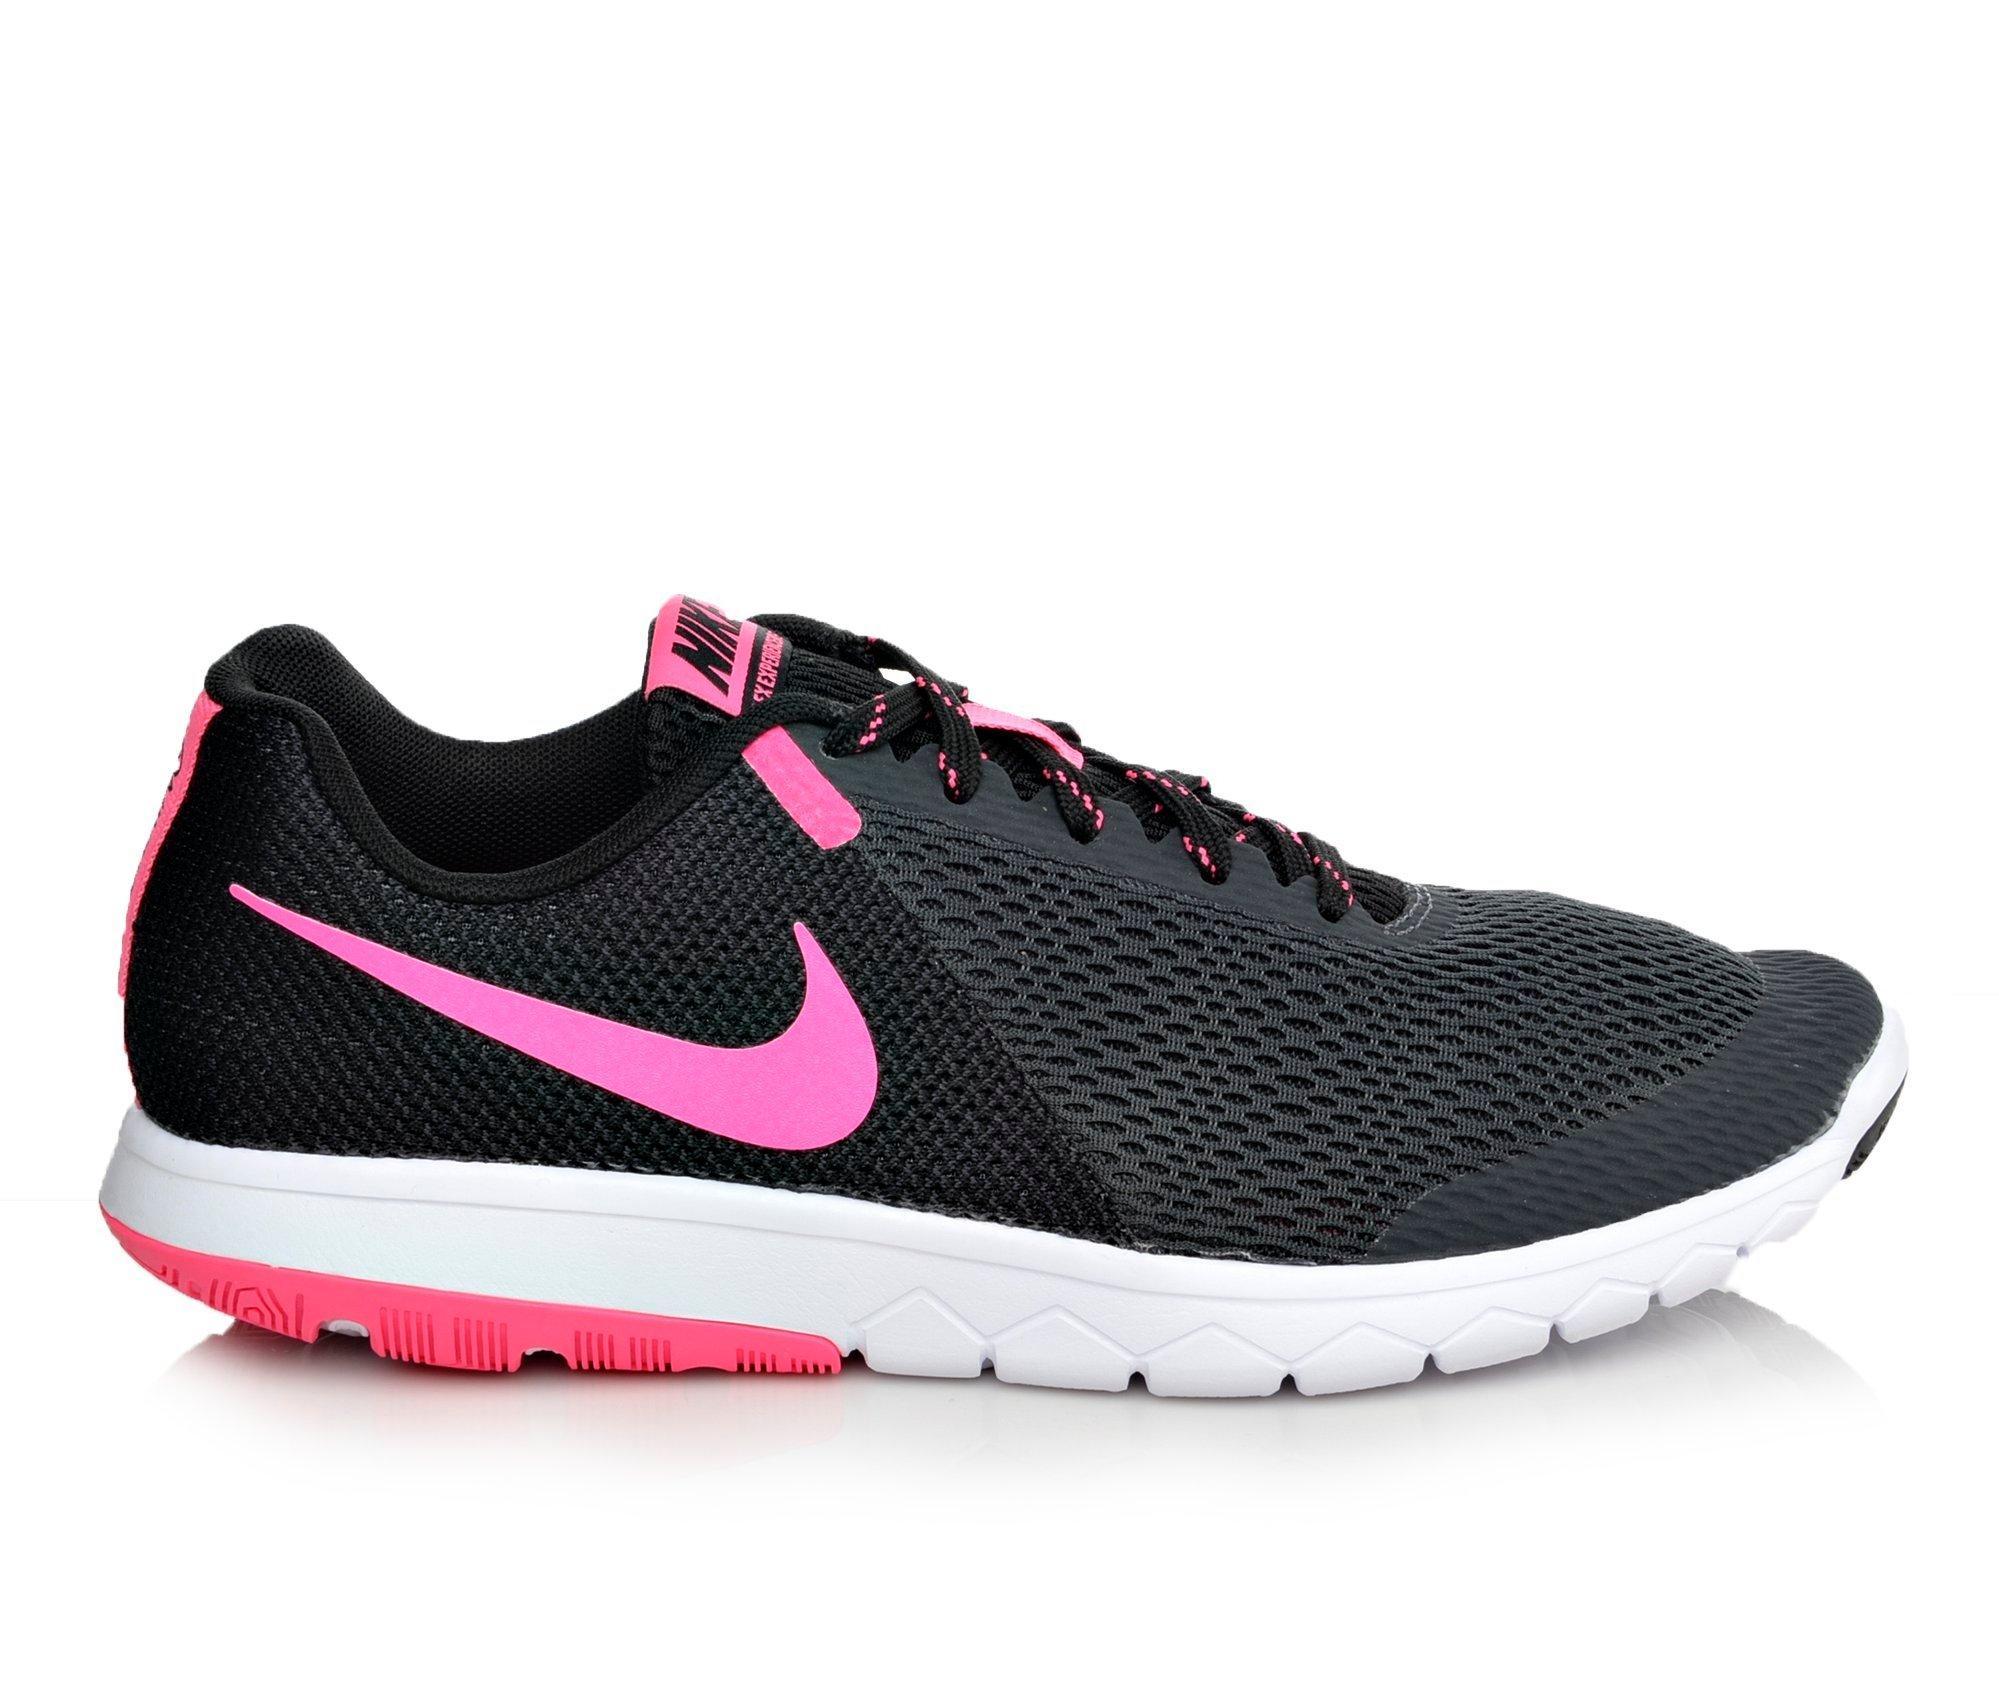 Nike air max torch 4 running shoe - Nike Flex Experience Run 5 Jade Volt Black